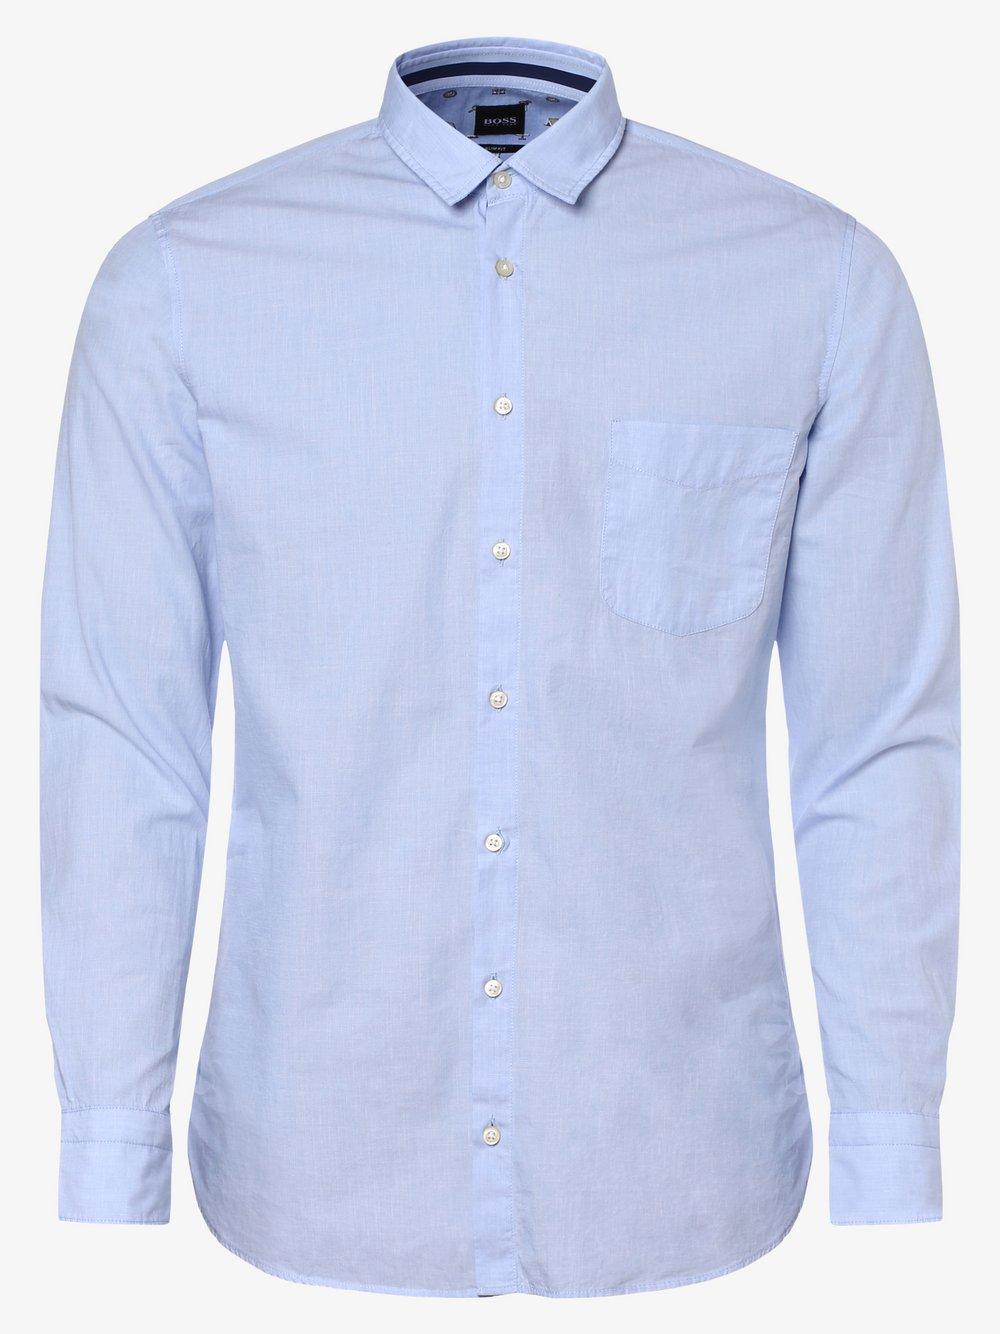 BOSS Casual - Koszula męska – Magneton_1, niebieski